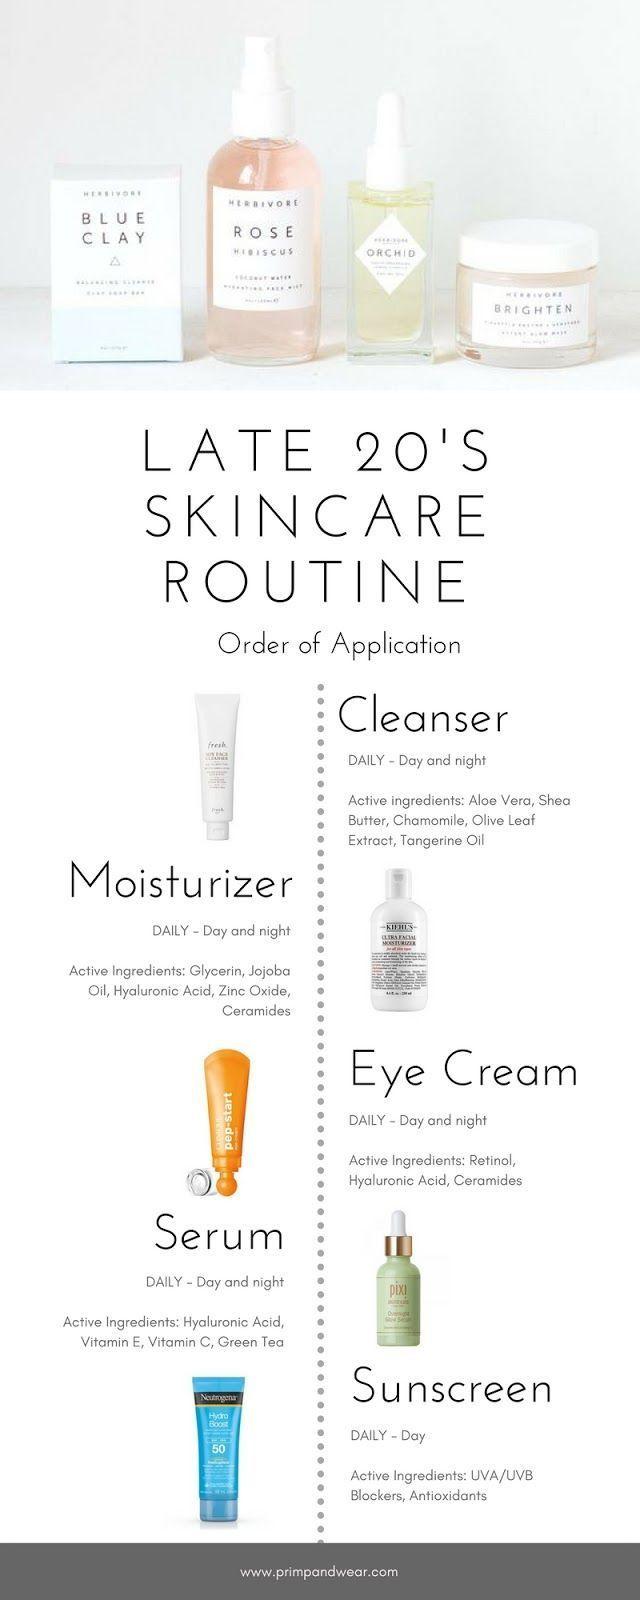 Primp Wear Late 20s Skincare Routine In 2020 Skin Care Natural Skin Care Skin Care Routine Order